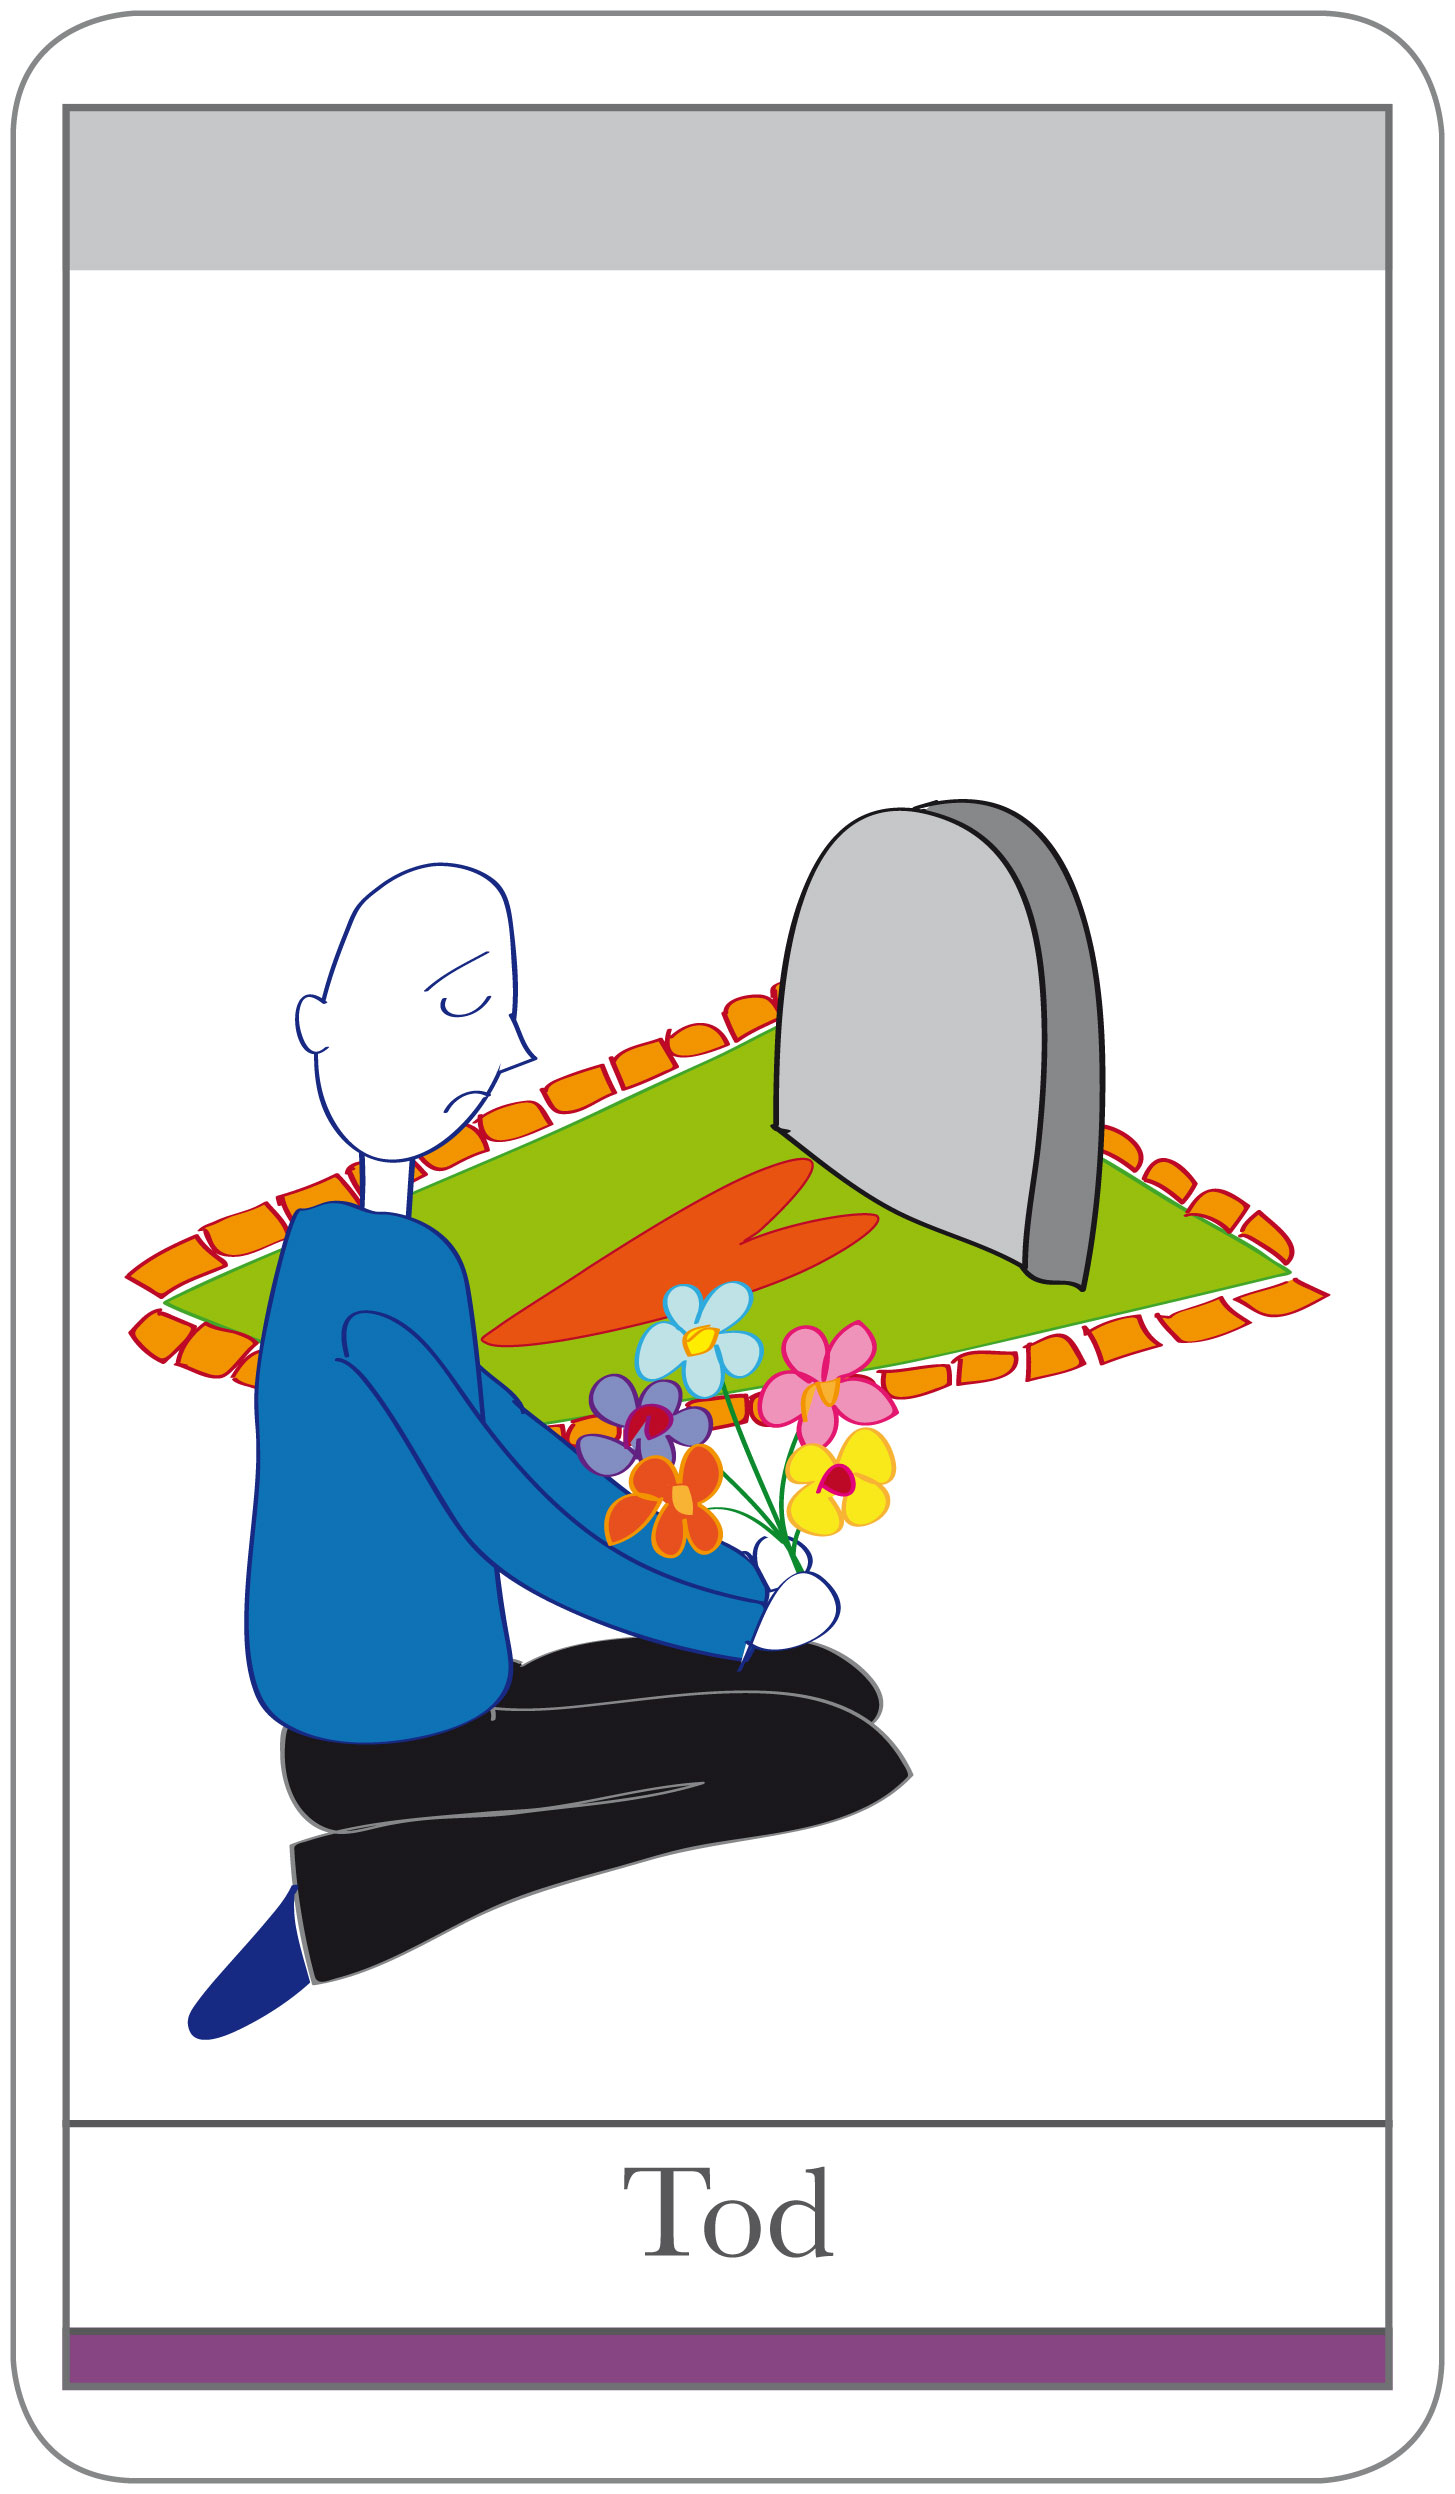 Karten Beziehung: Thema Tod